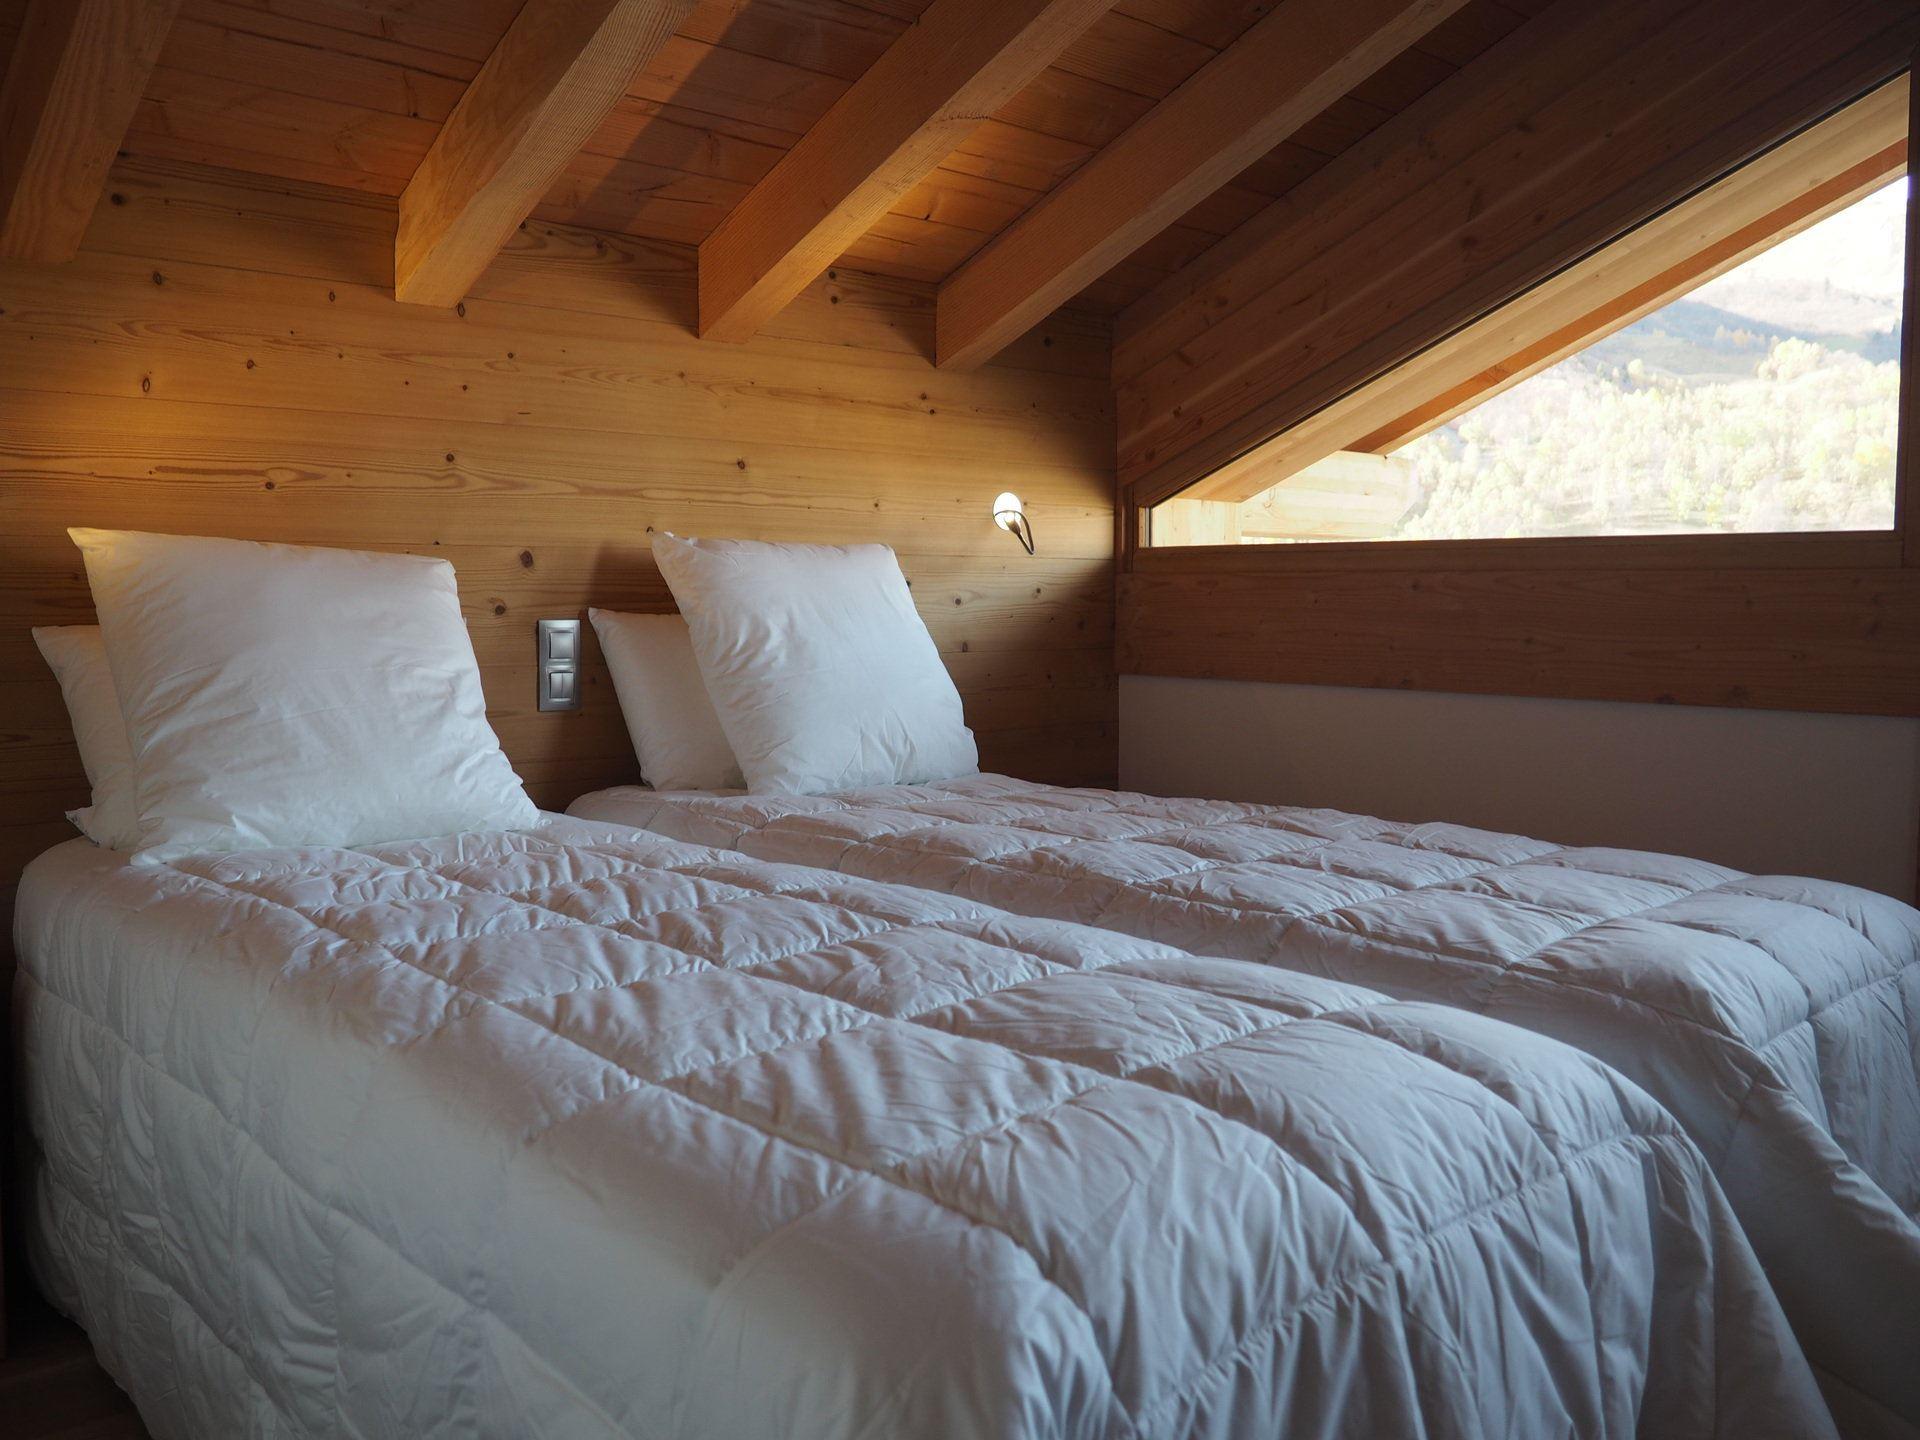 7 Room 12 Pers ski-in ski-out / CASEBLANCHE H8